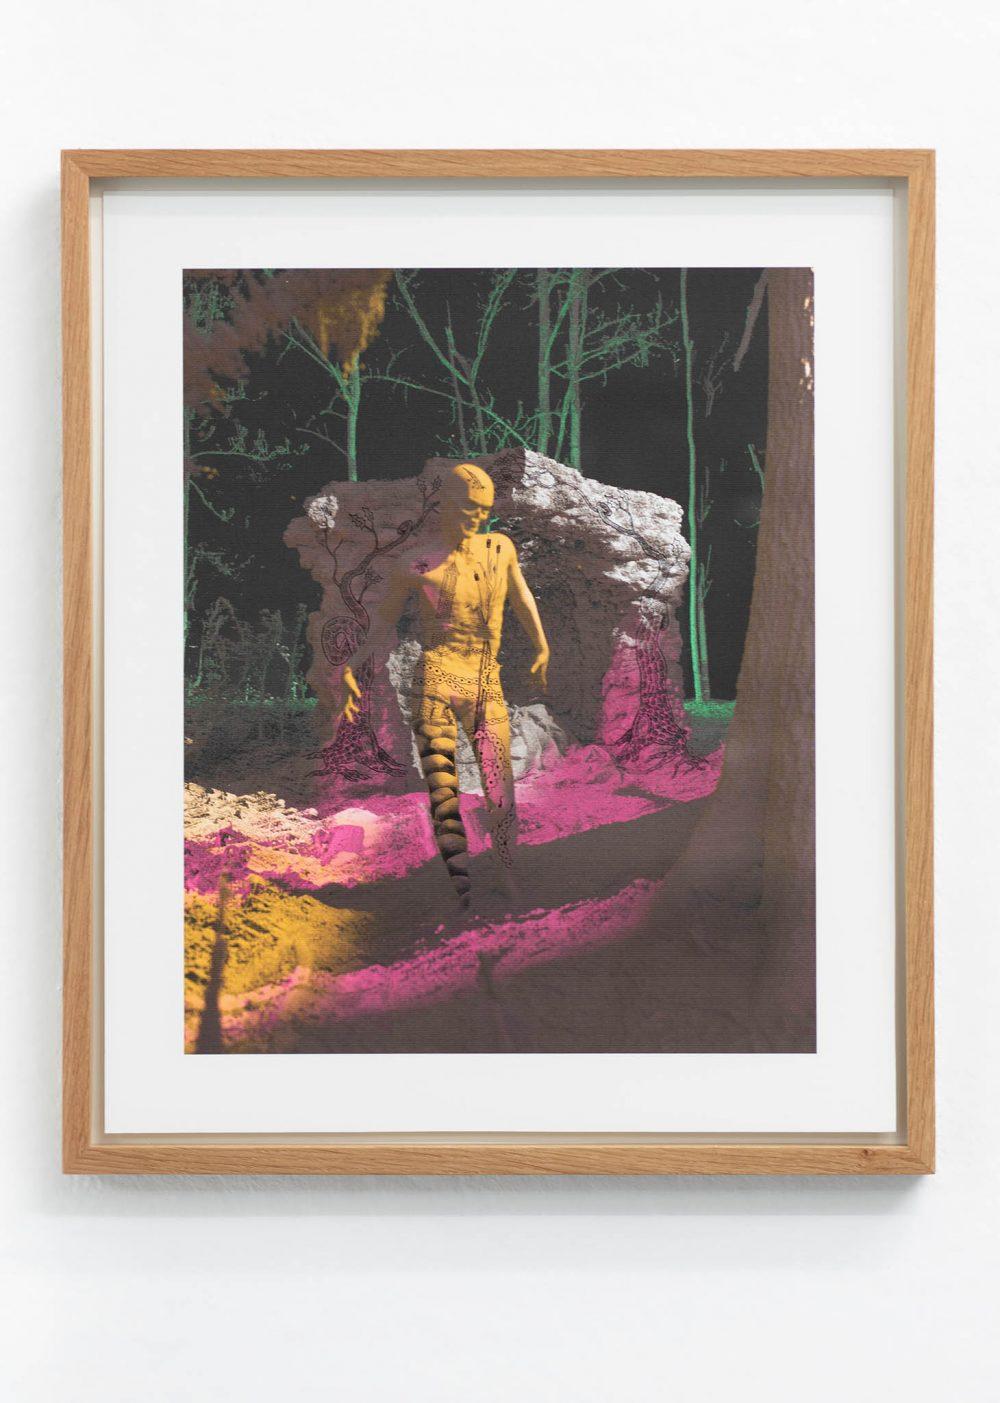 Tim Berresheim | Angst | Falko Alexander gallery